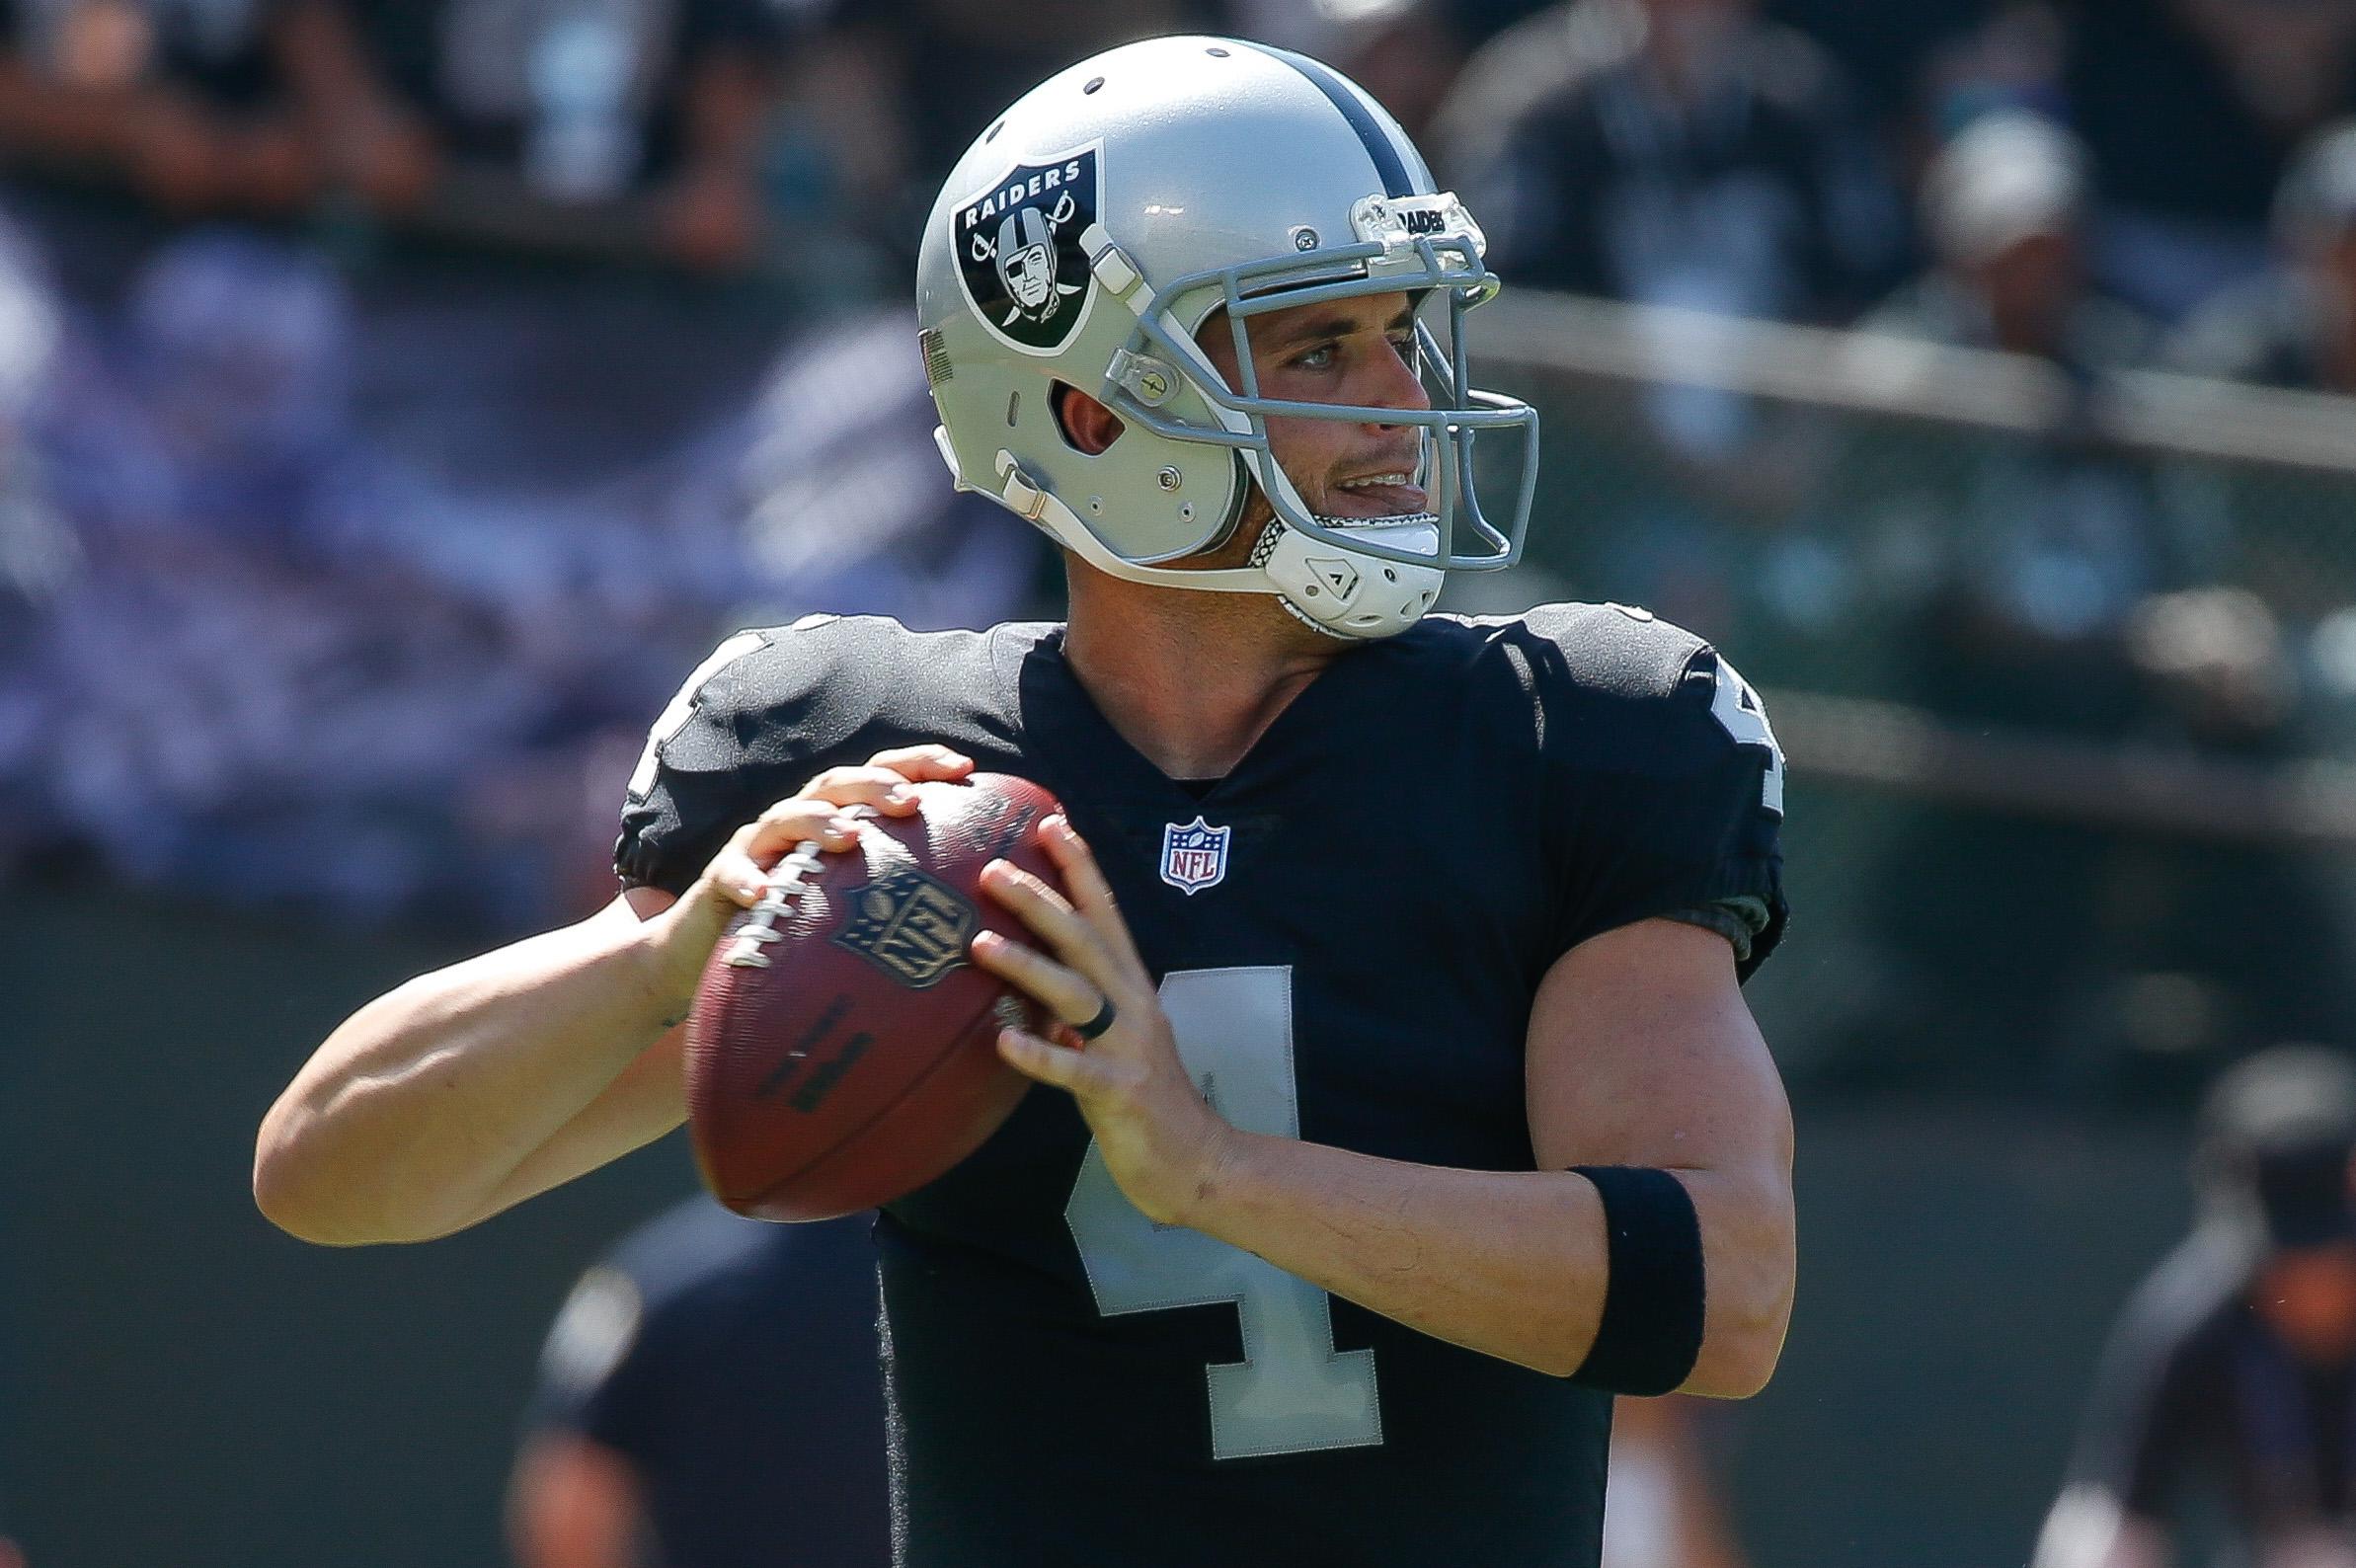 Raiders vs. Washington odds 2017: Oakland a road betting favorite for Sunday night